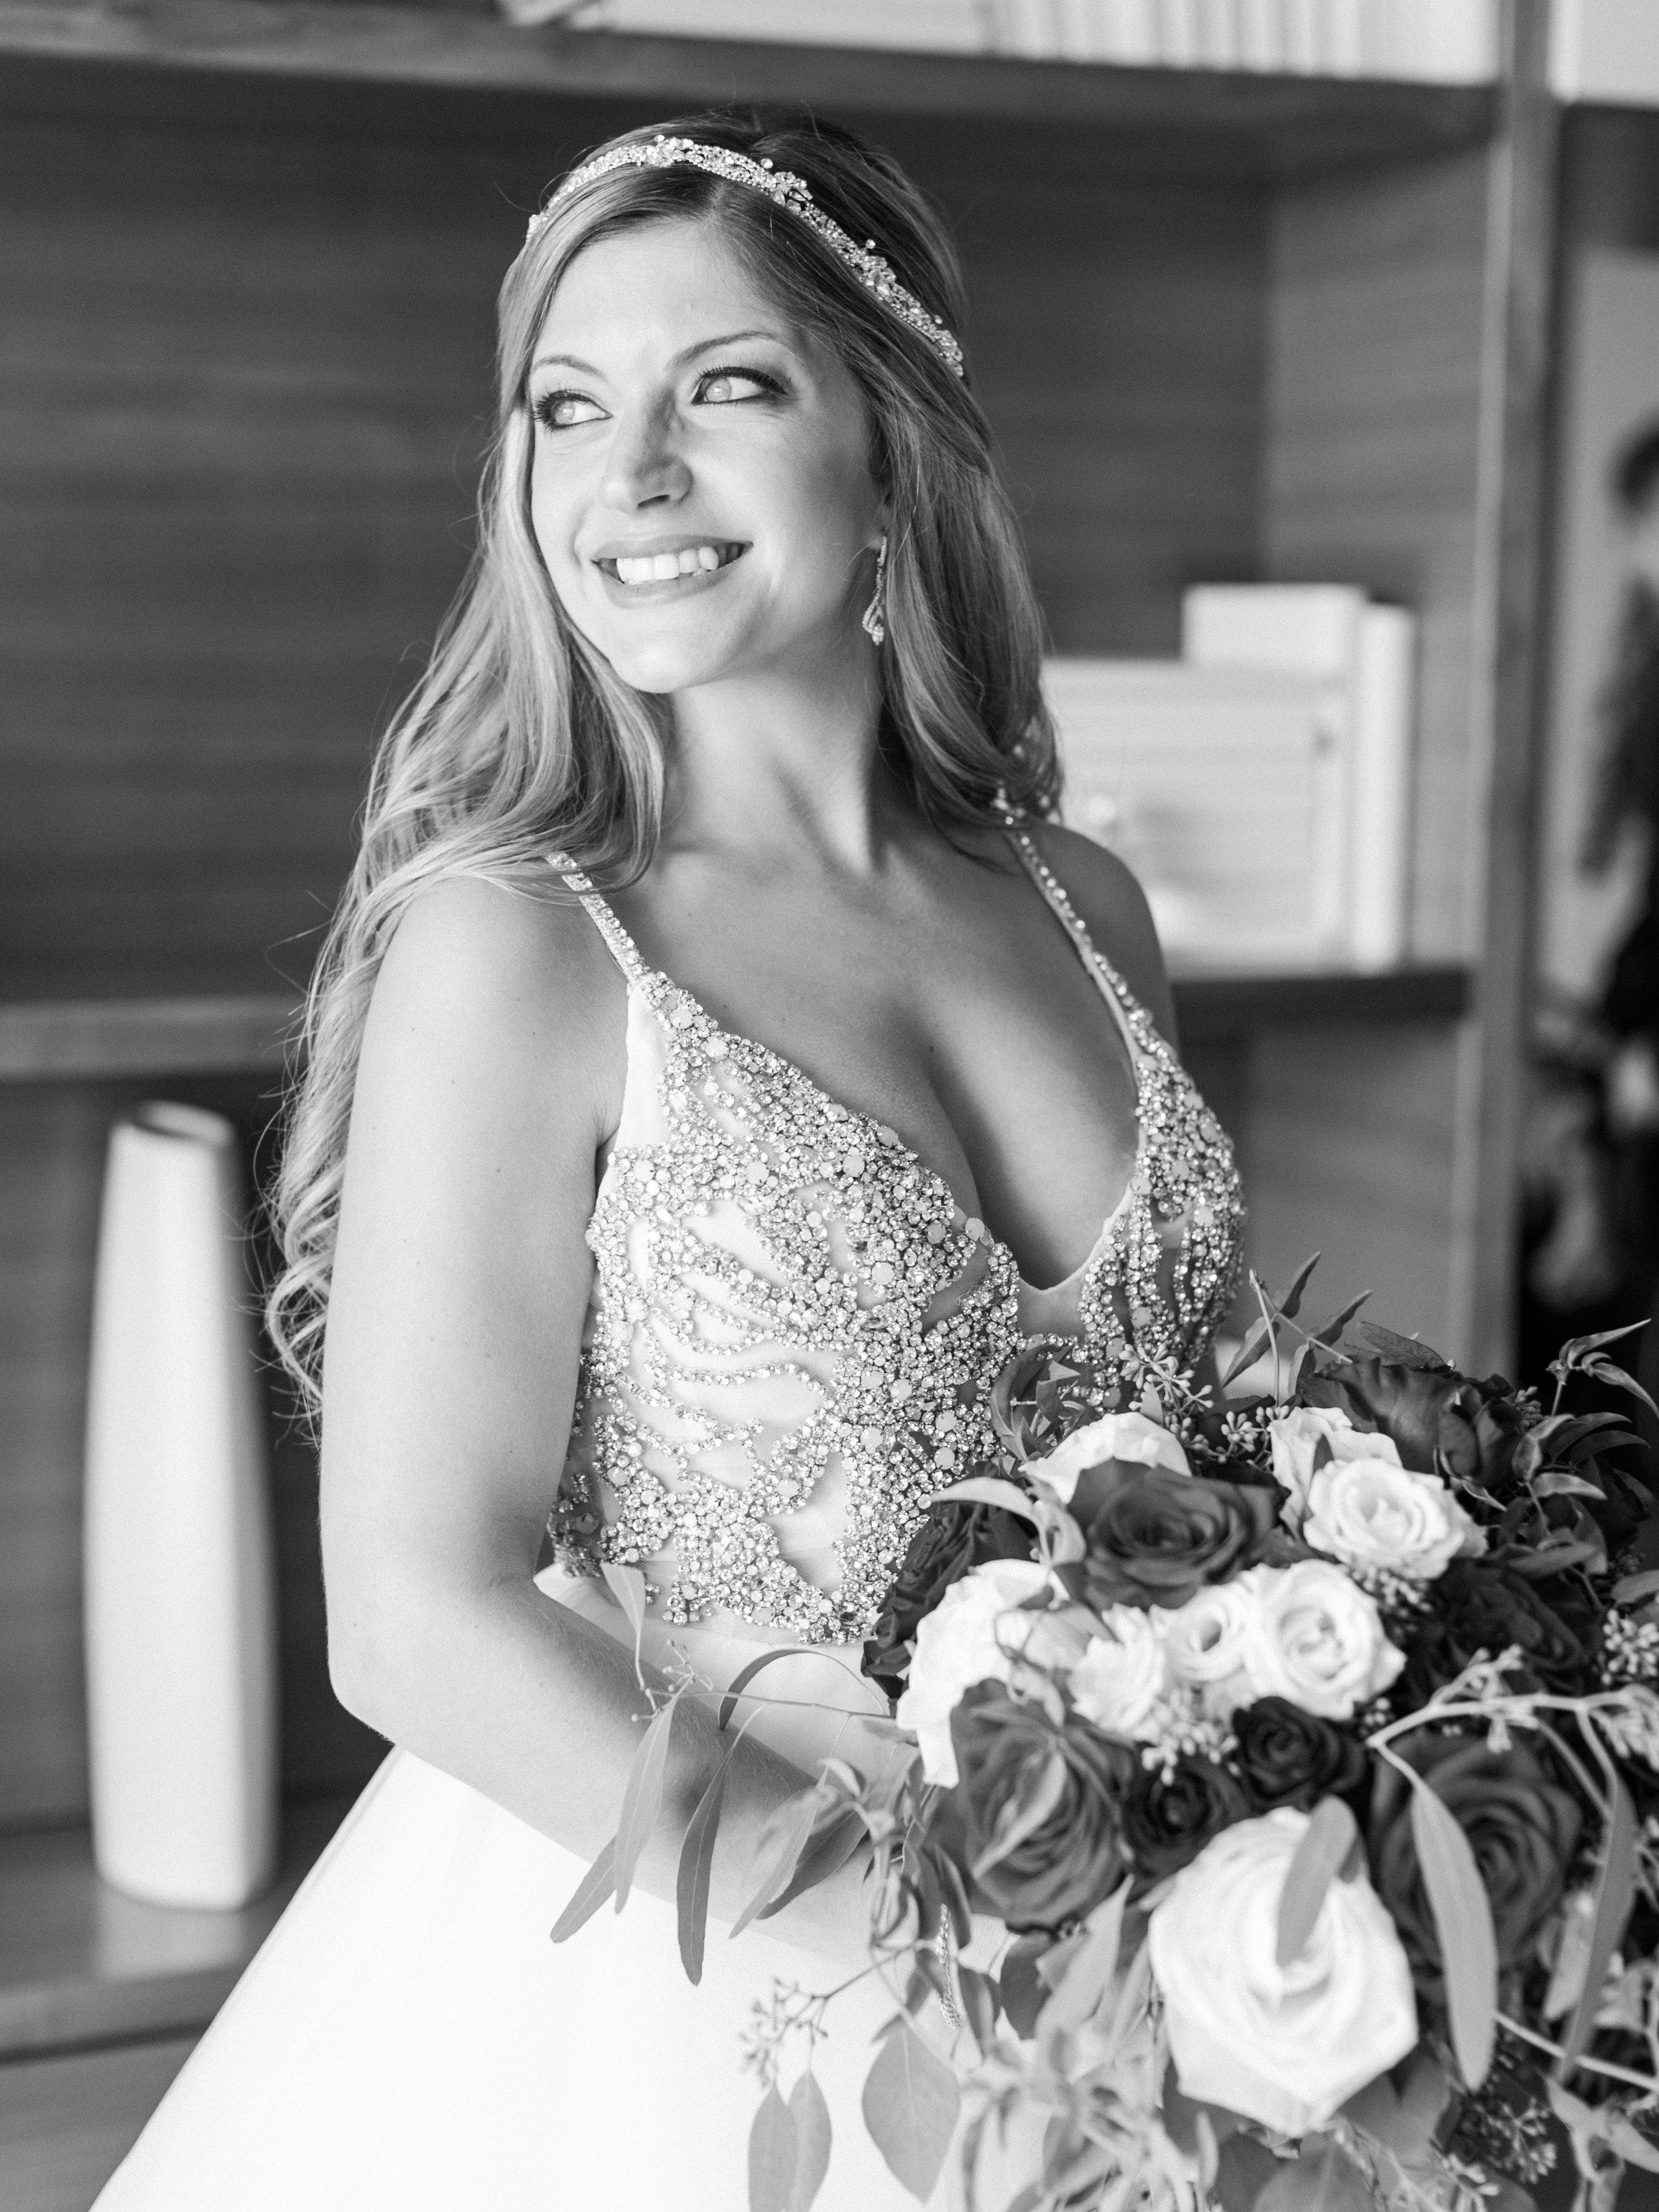 hyatt-regency-jersey-city-wedding-photographer15.jpg